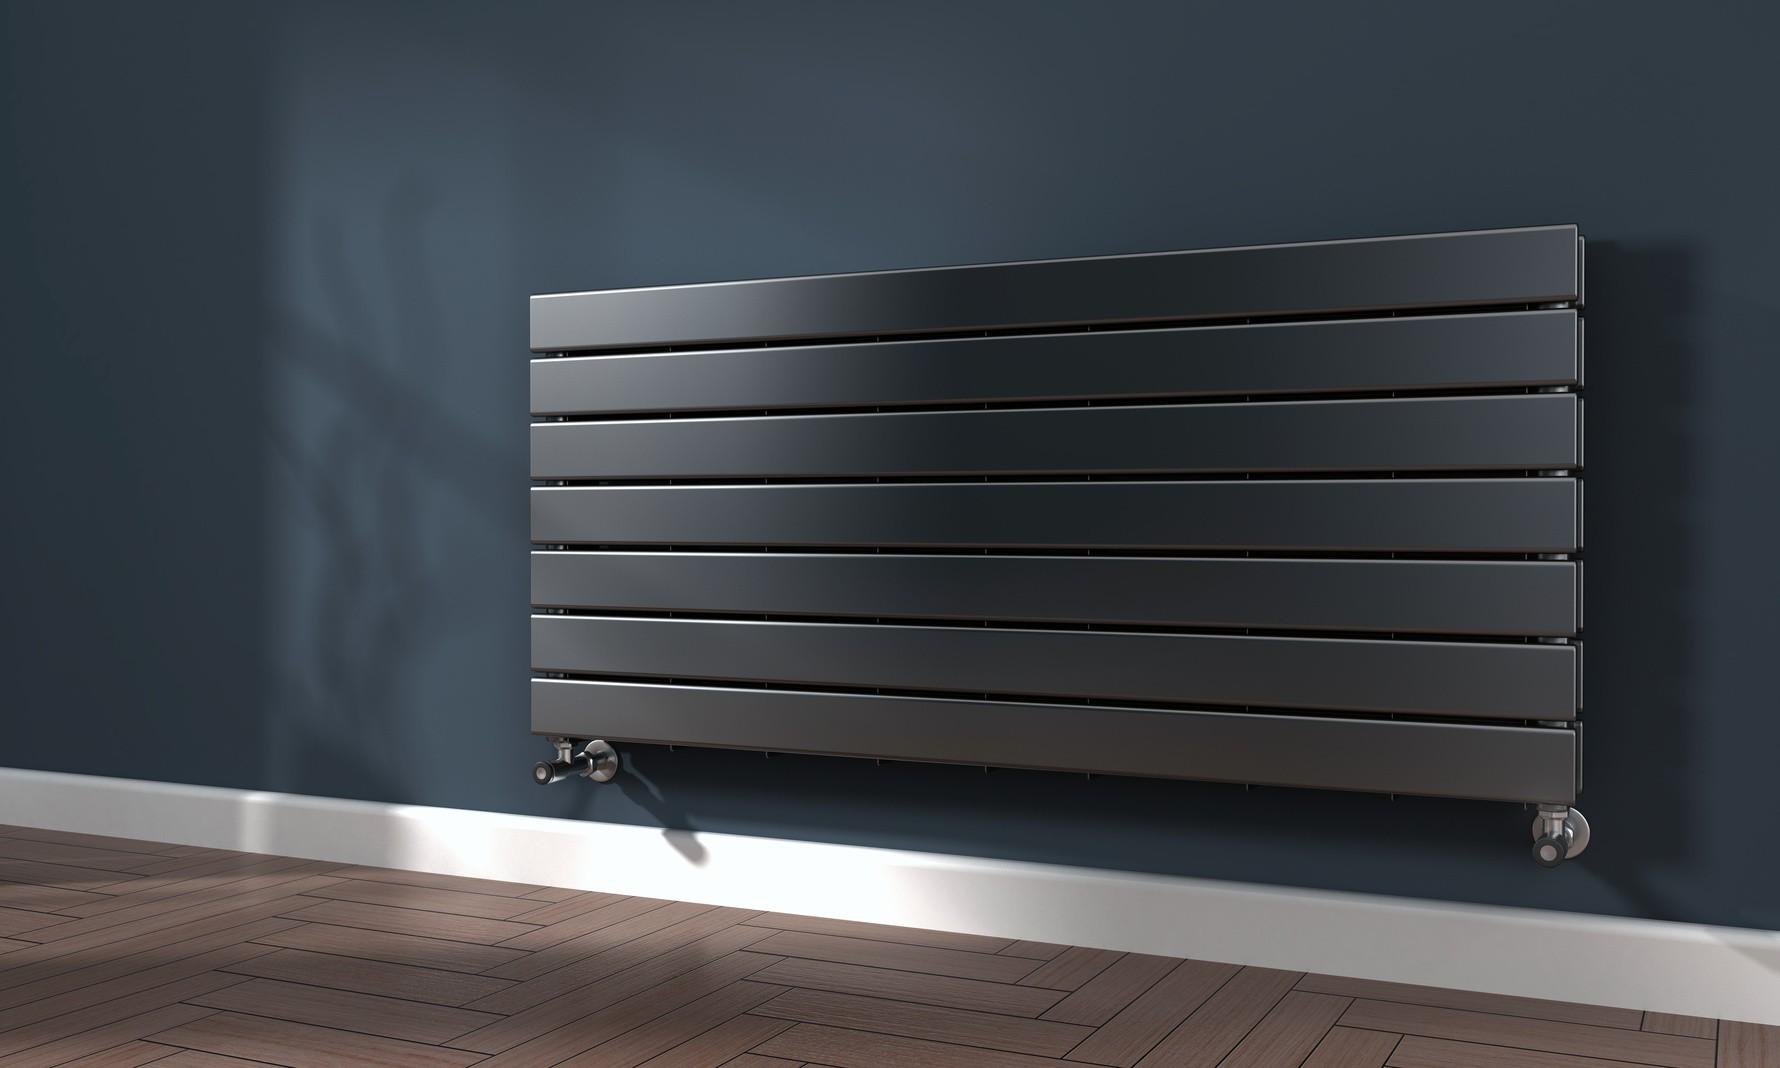 Ceustermans verwarming & sanitair uit Balen | warmtepompen, zonneboiler, sanitair, verwarming en badkamerrenovatie